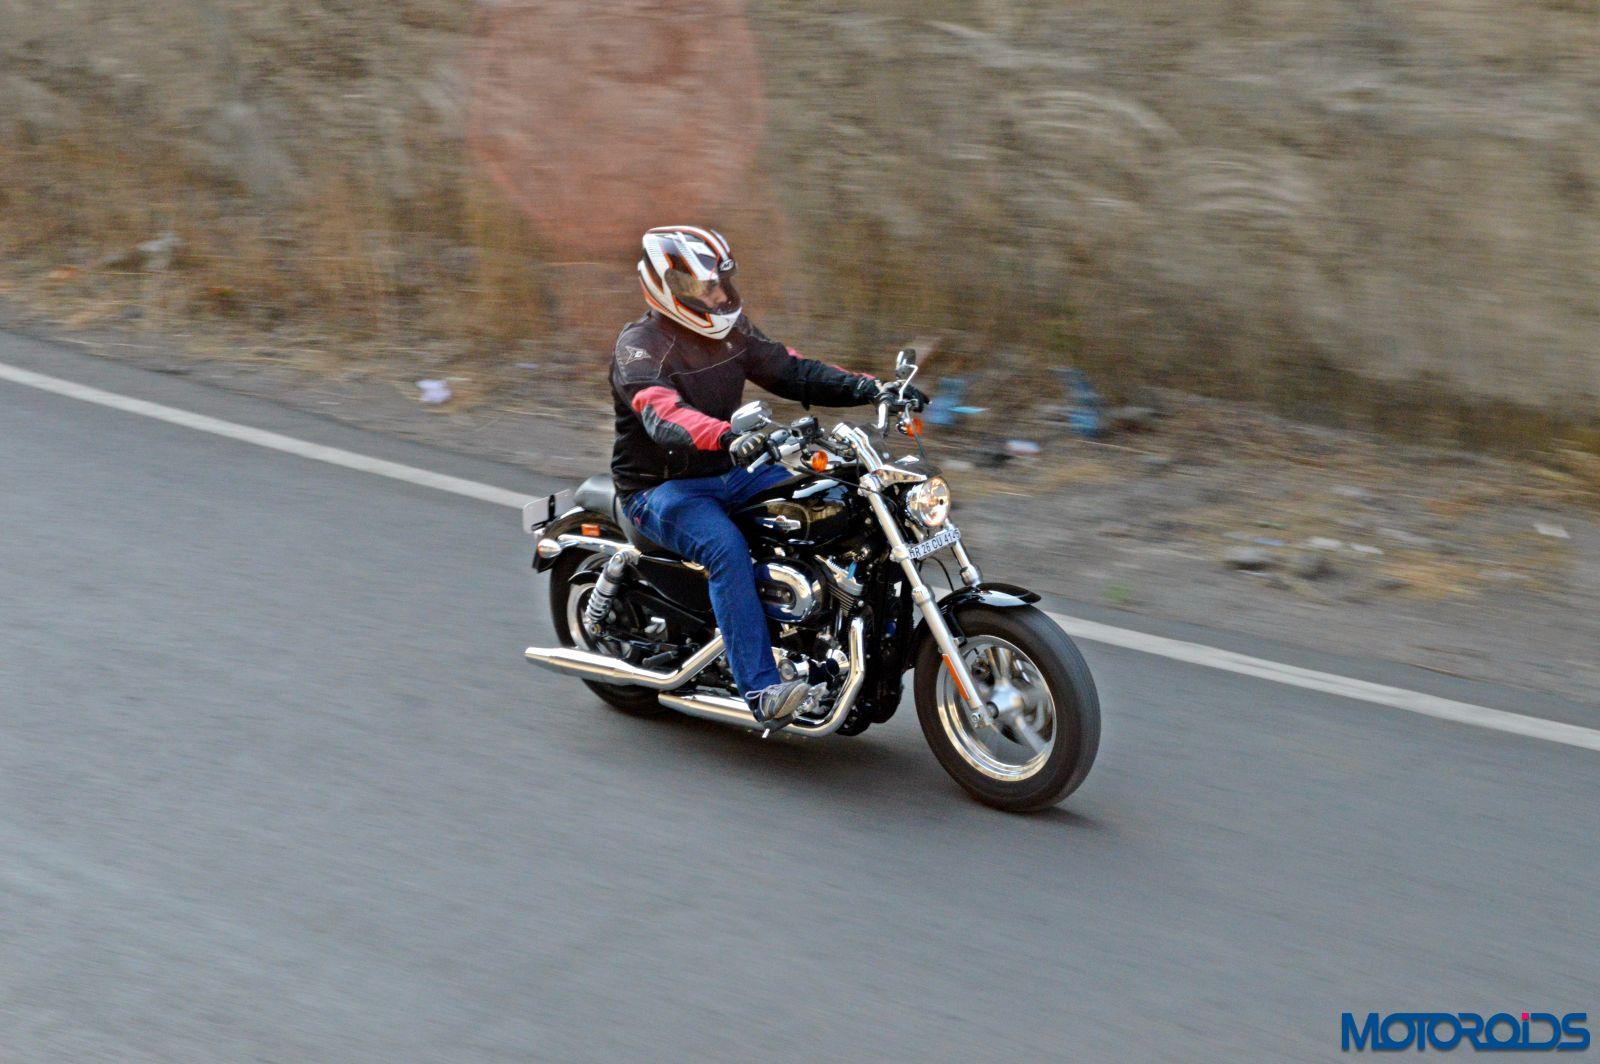 Harley-Davidson 1200 Custom Review - Action Shots (1)